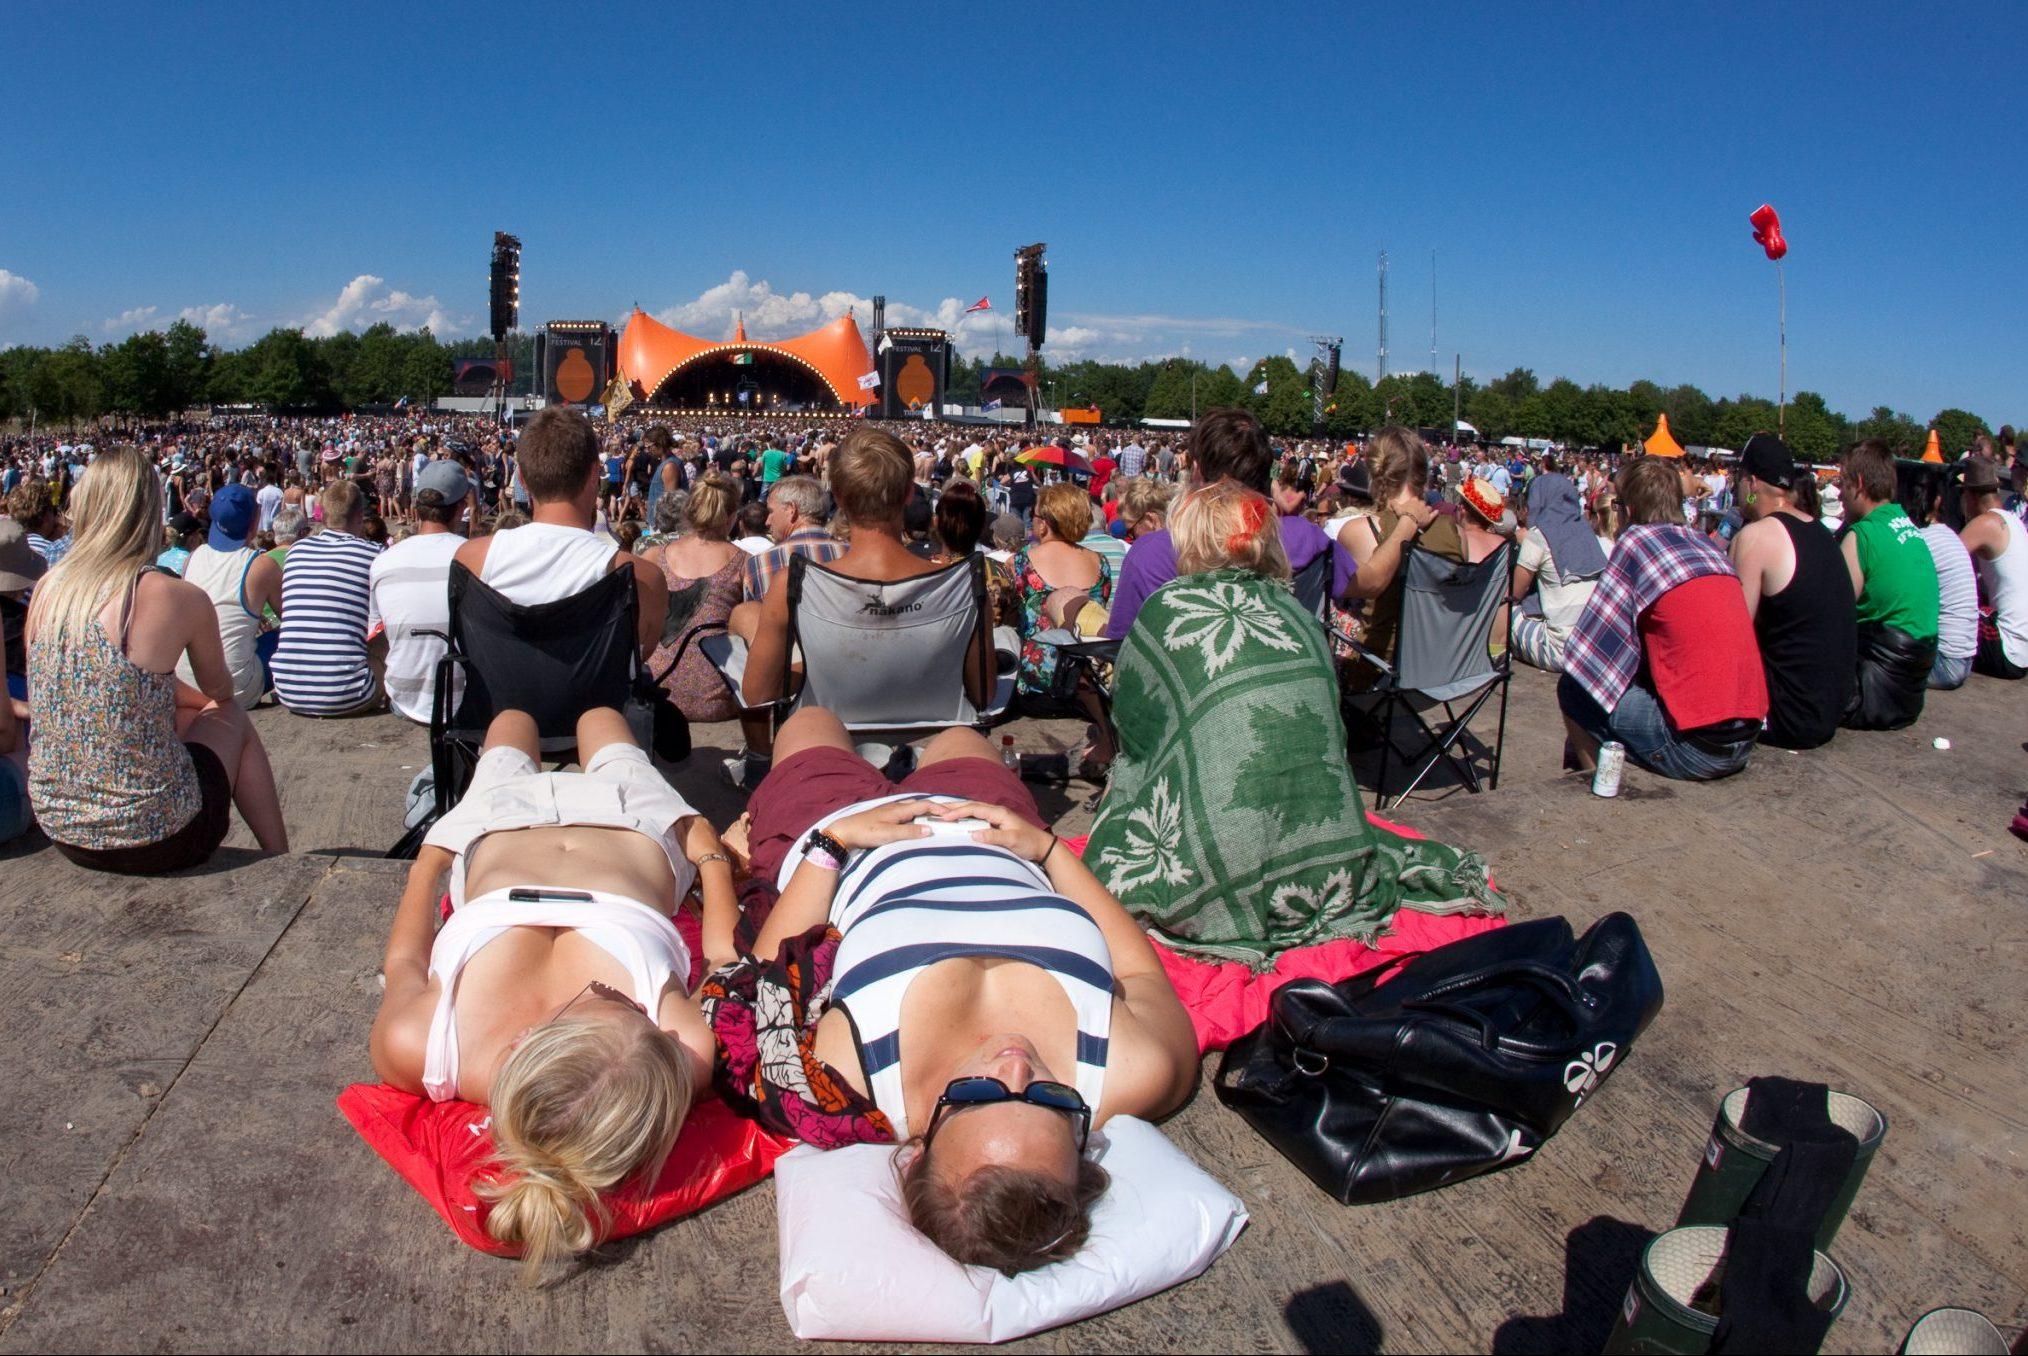 Der kommer mere støtte til aflyste danske festivaler som følge af forsamlingsforbuddet under coronakrisen. Arkivpressefoto: Per Lange for VisitDenmark.